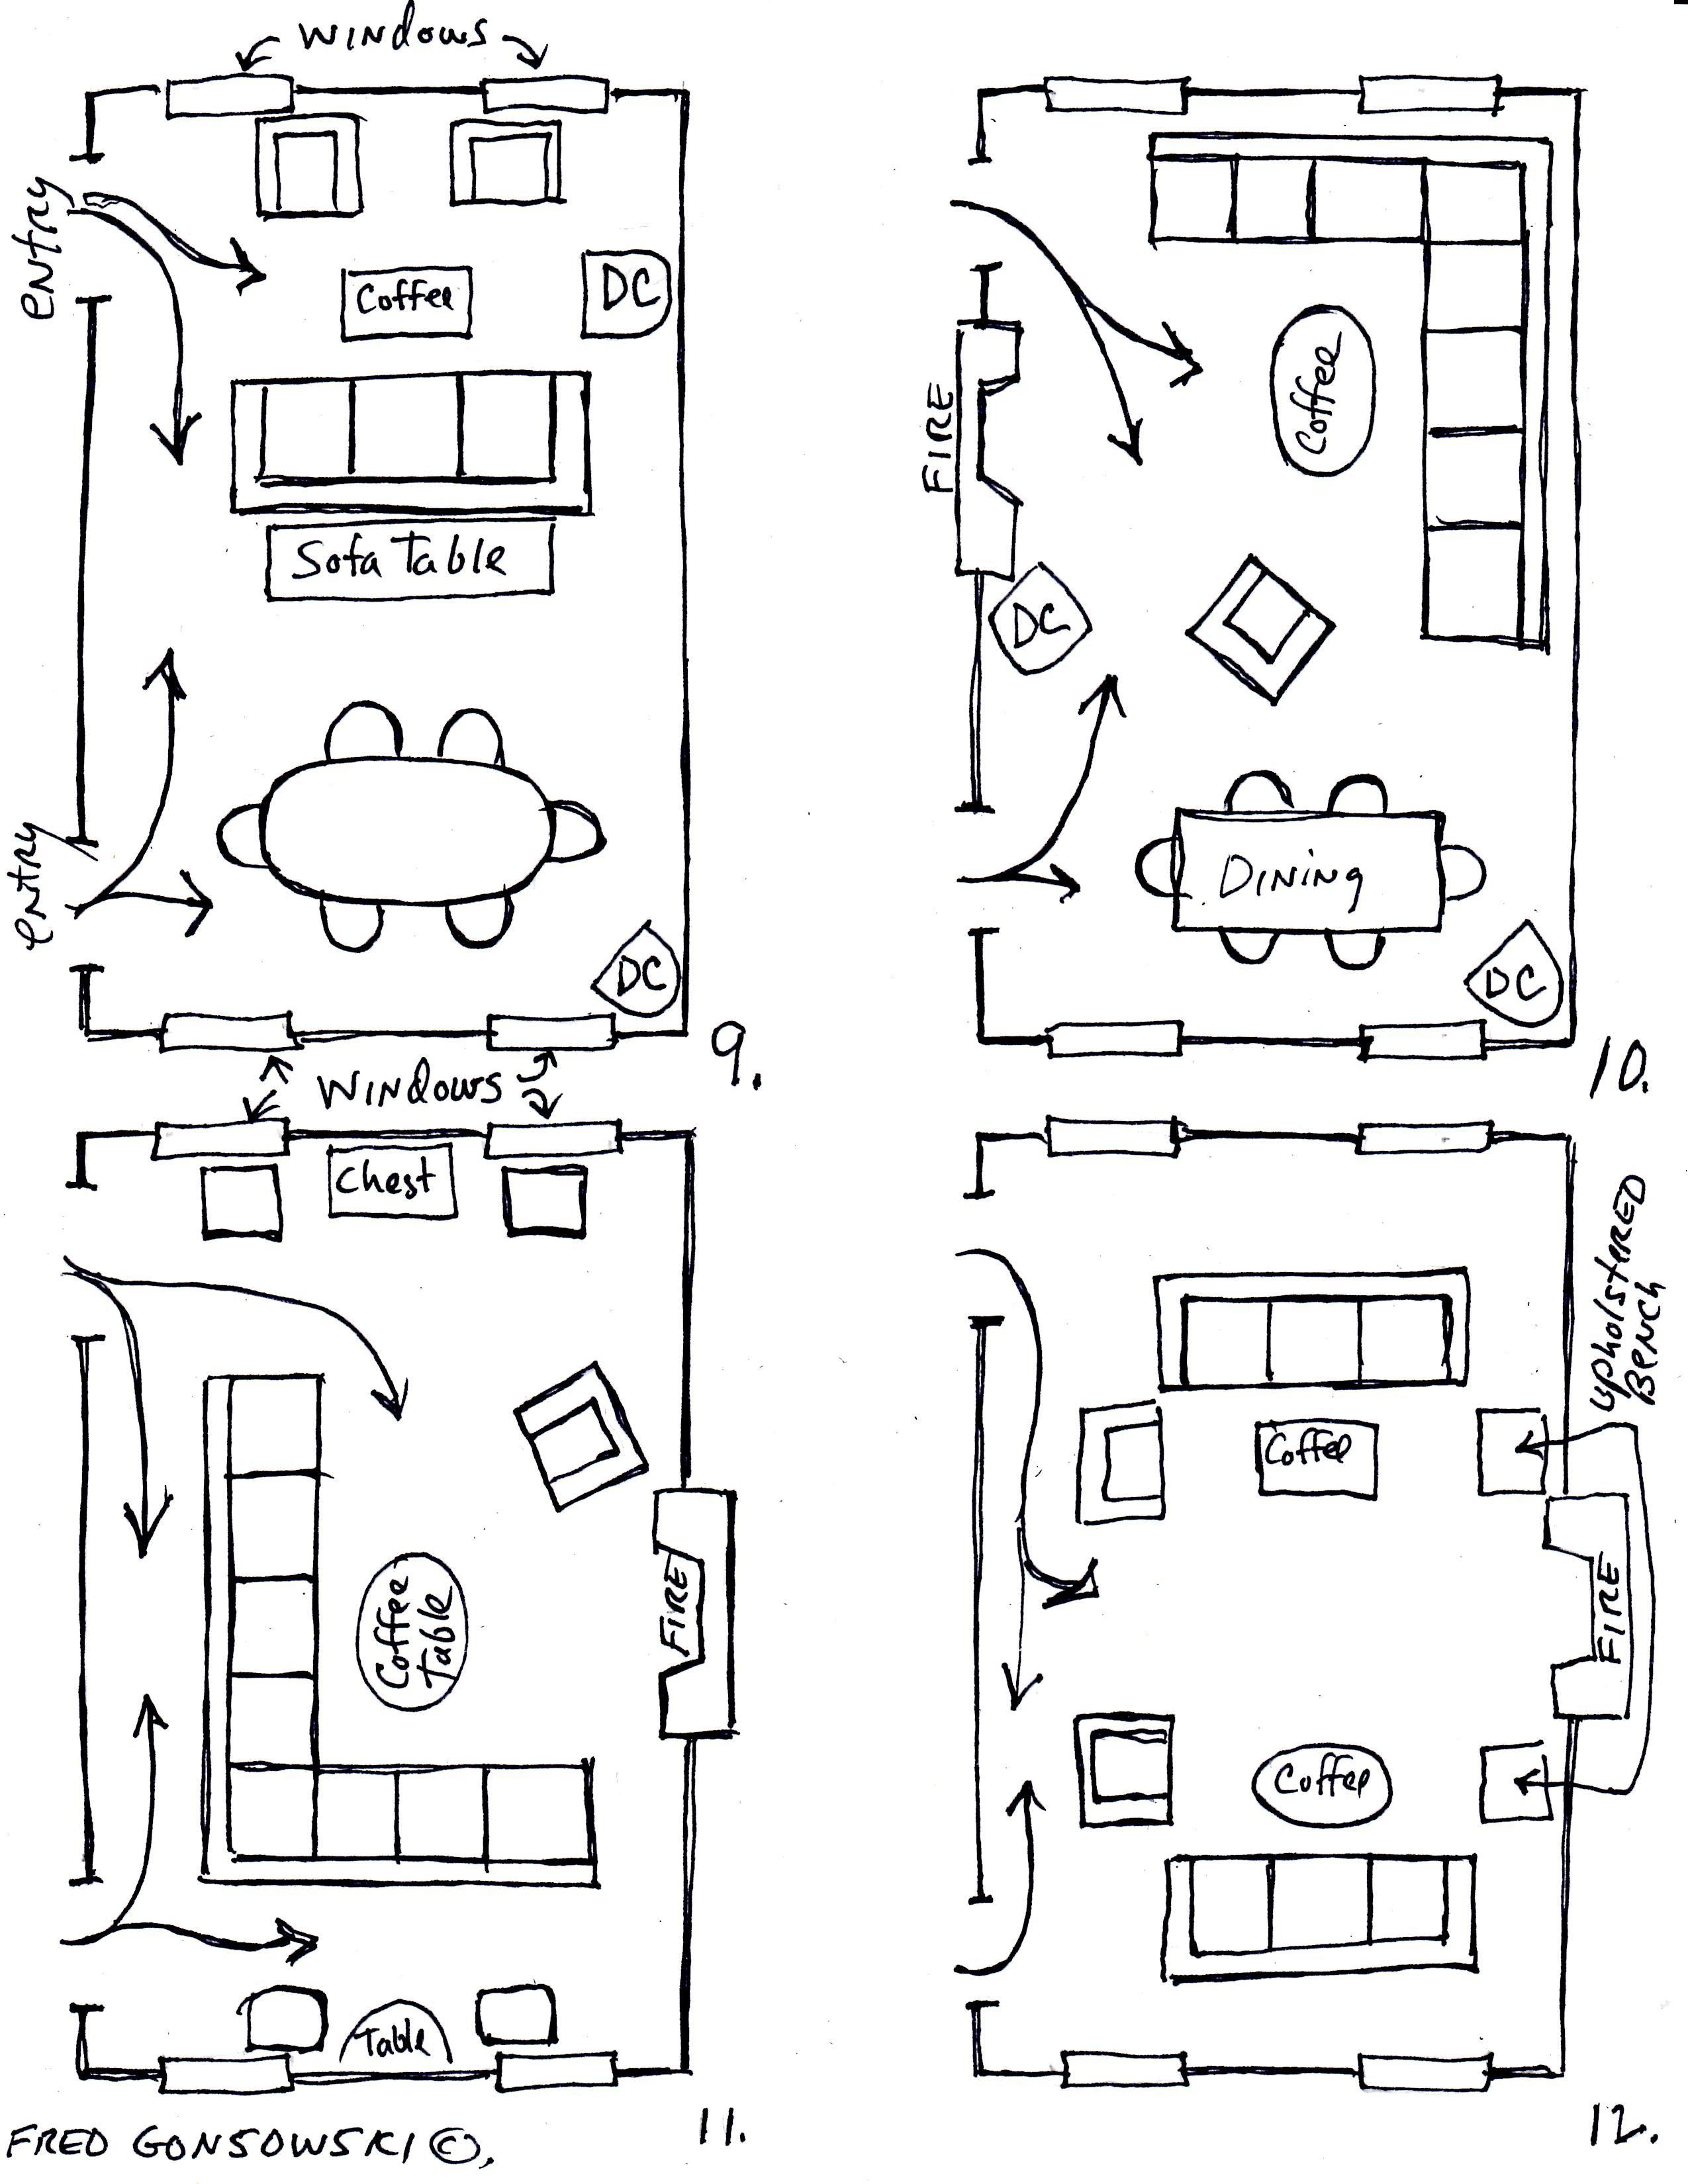 furniture setup for rectangular living room bottom left [ 2550 x 3300 Pixel ]